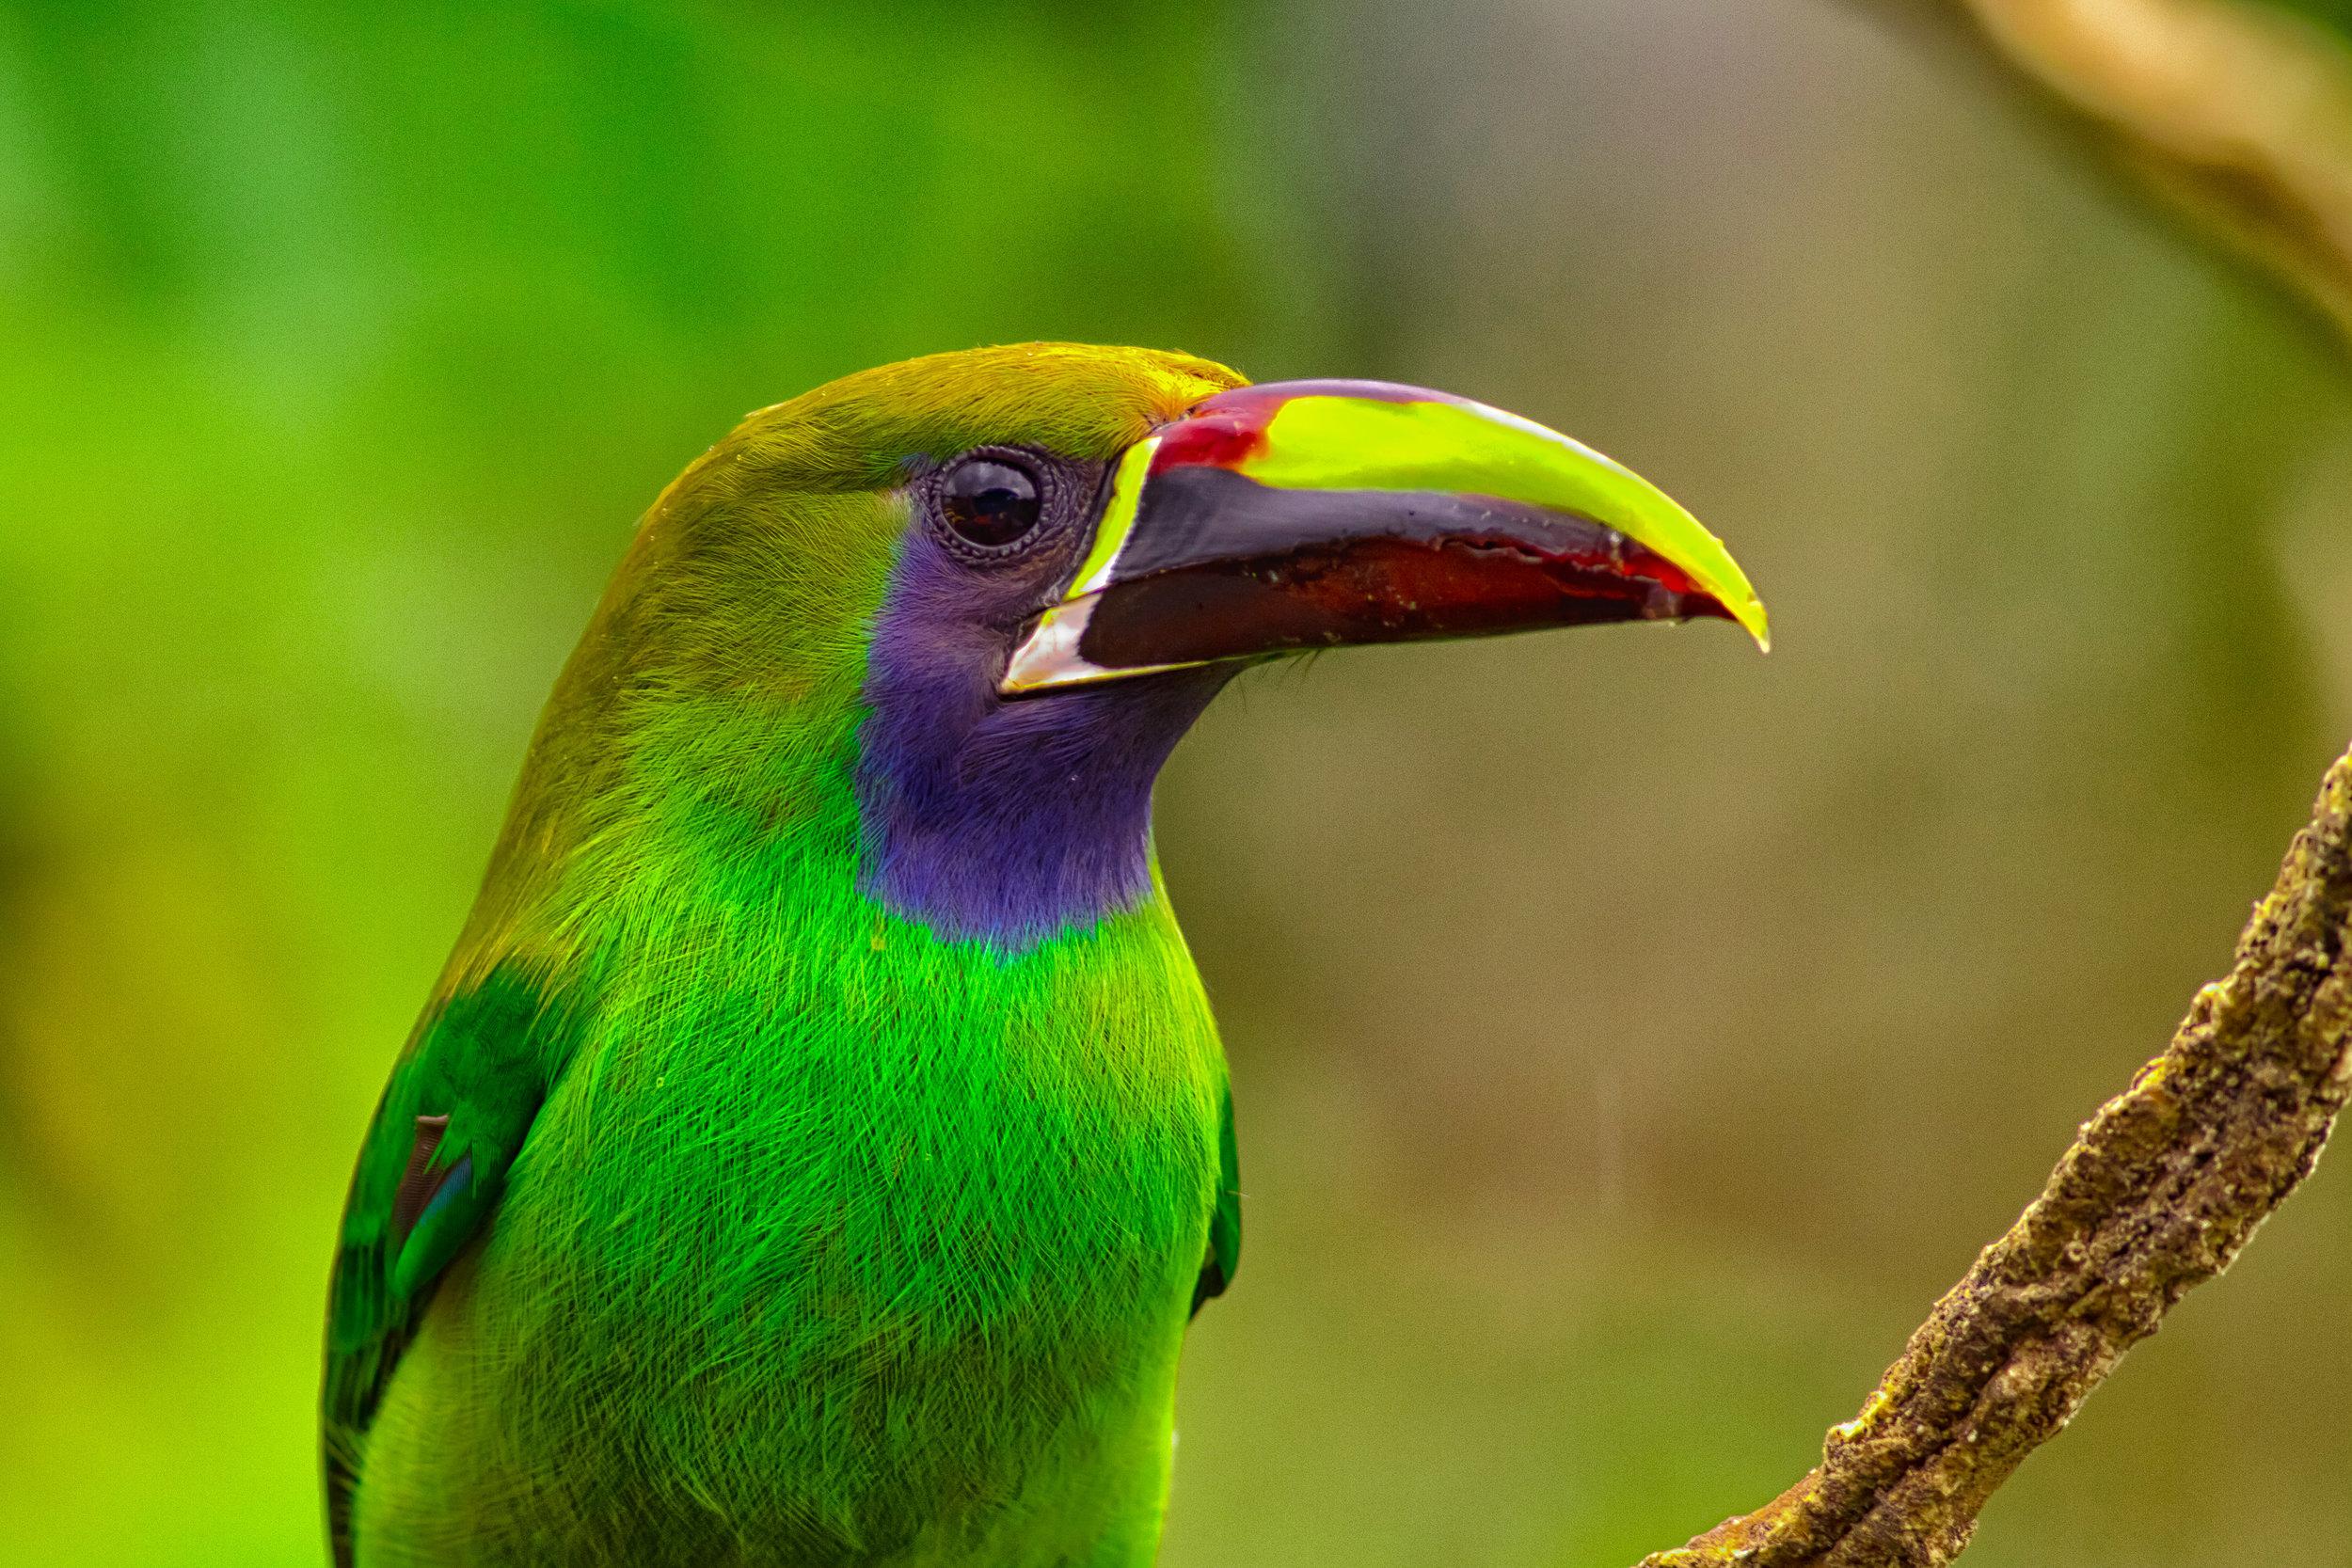 Costa-Rica-Emerald-Toucanet-Wildlife-Photography-Kusini-Collection-©AlexArias.jpg